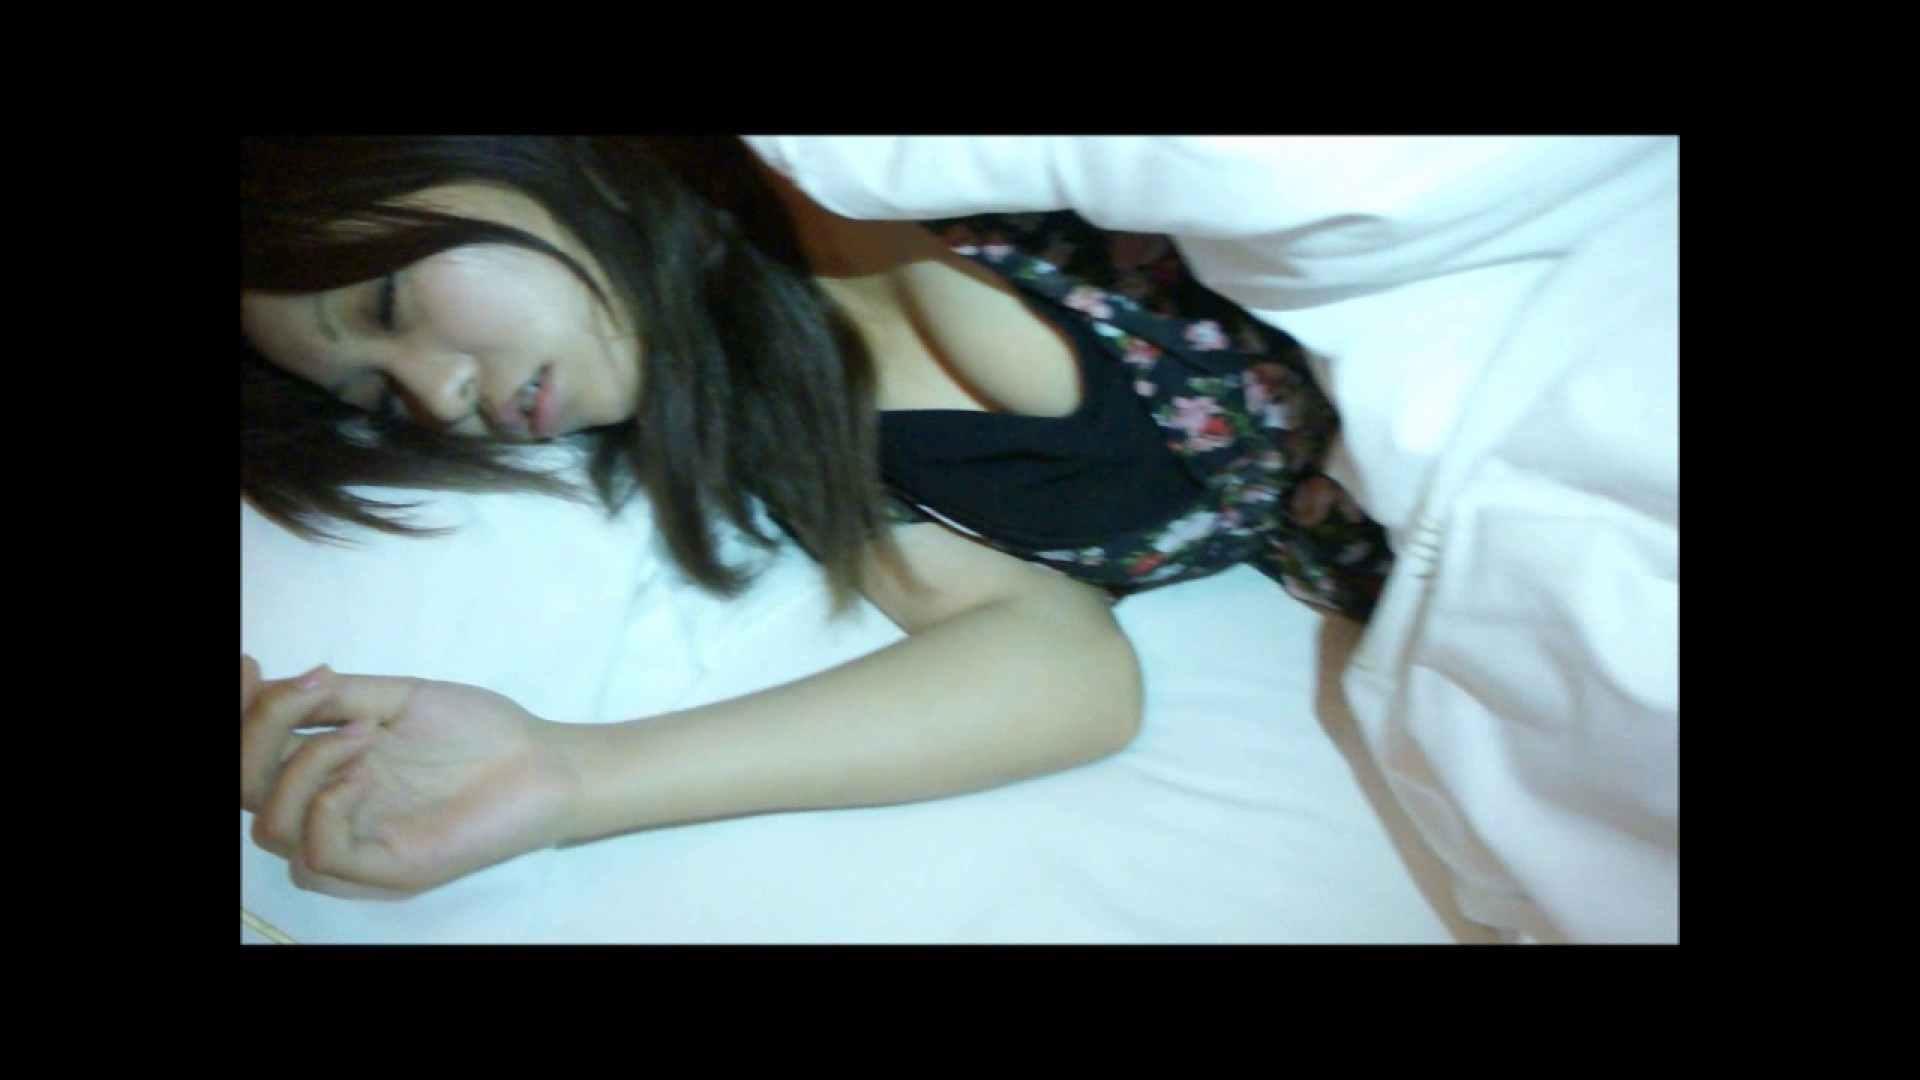 Vol.16 失恋を引きずる葵 綺麗なOLたち   巨乳特別編  51枚 23